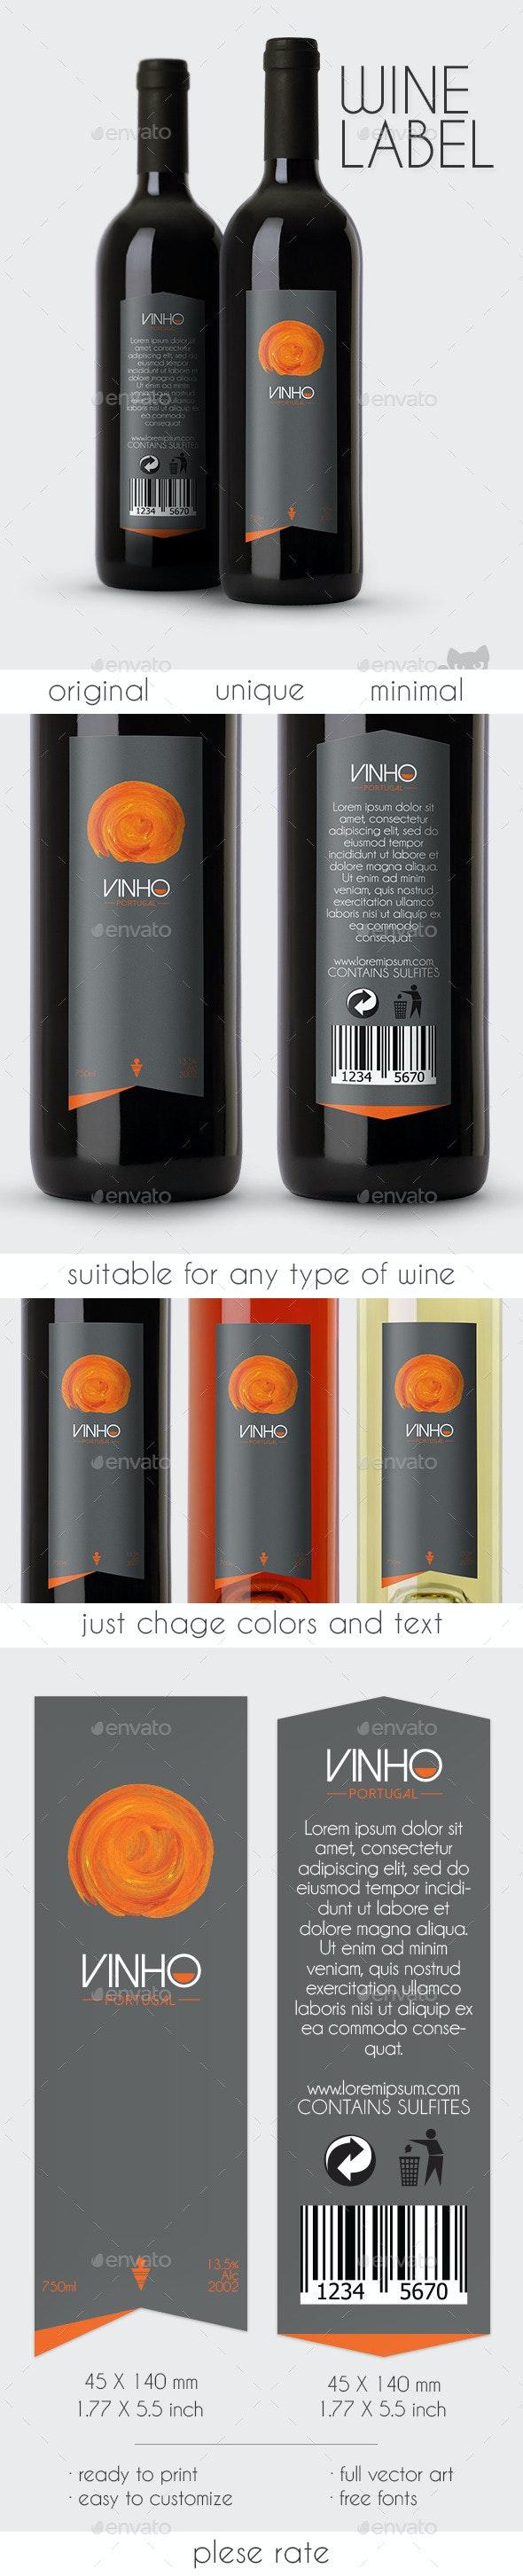 Vinho Wine Label - Packaging Print Templates